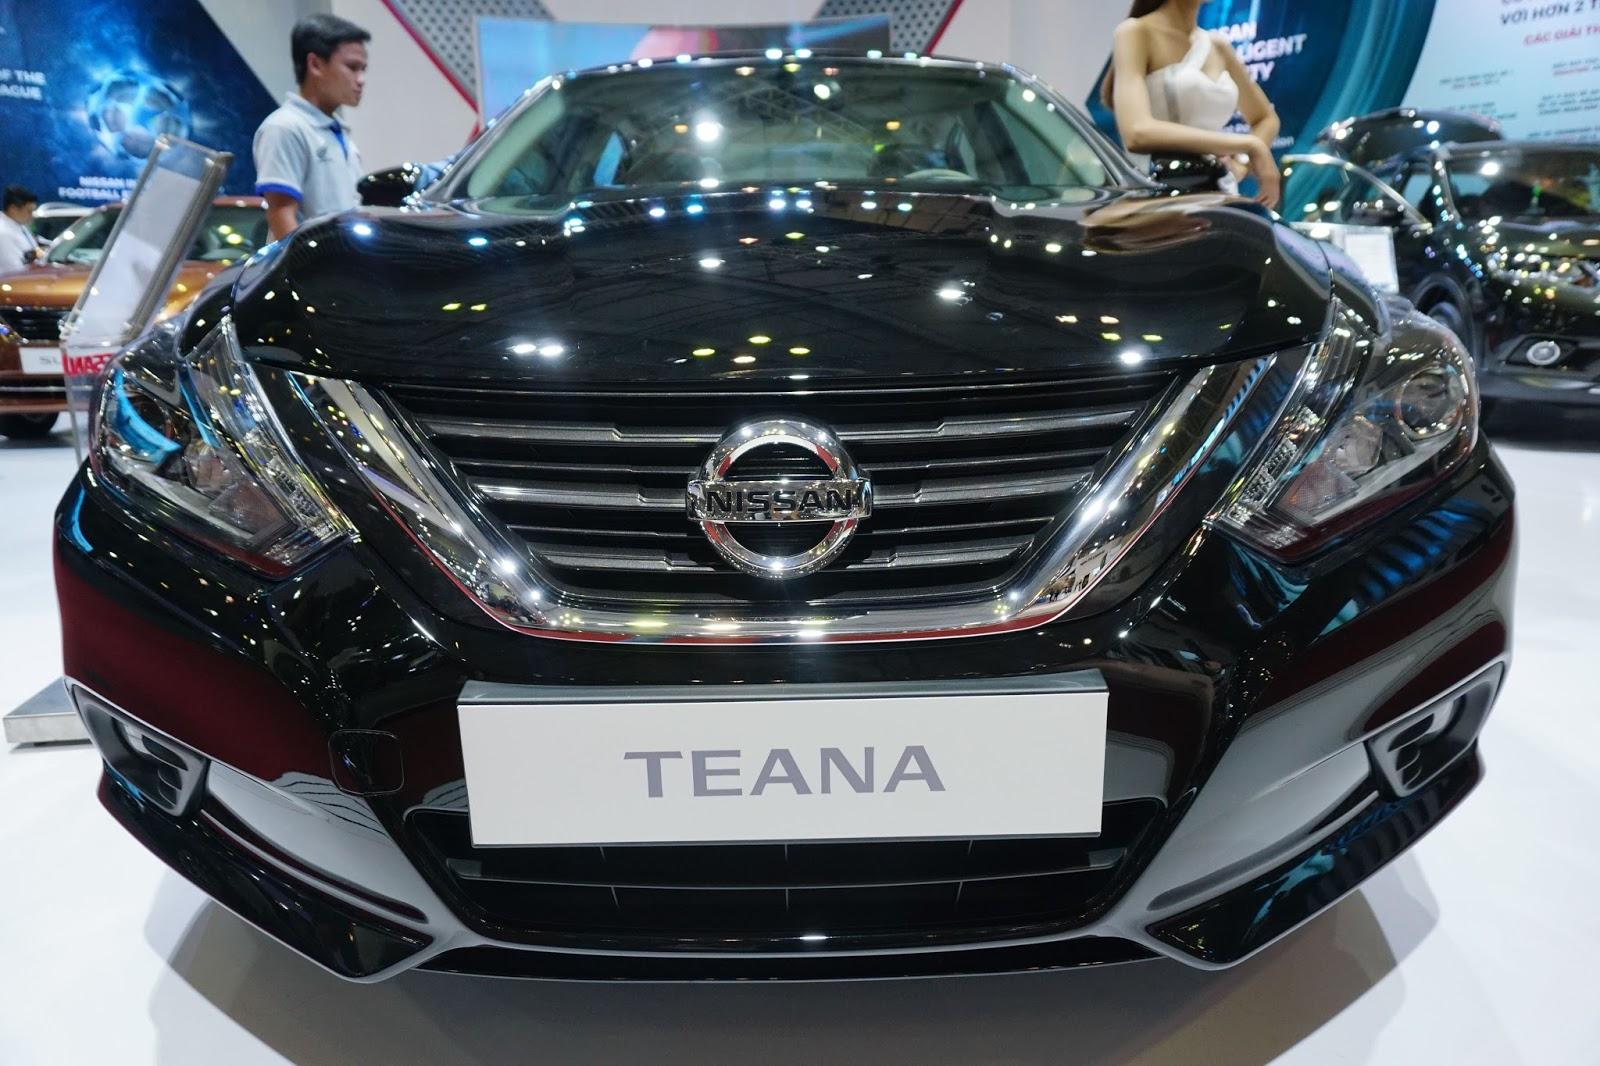 Nissan-teana-sedan-hang-trung-tot-nhat-02.jpg